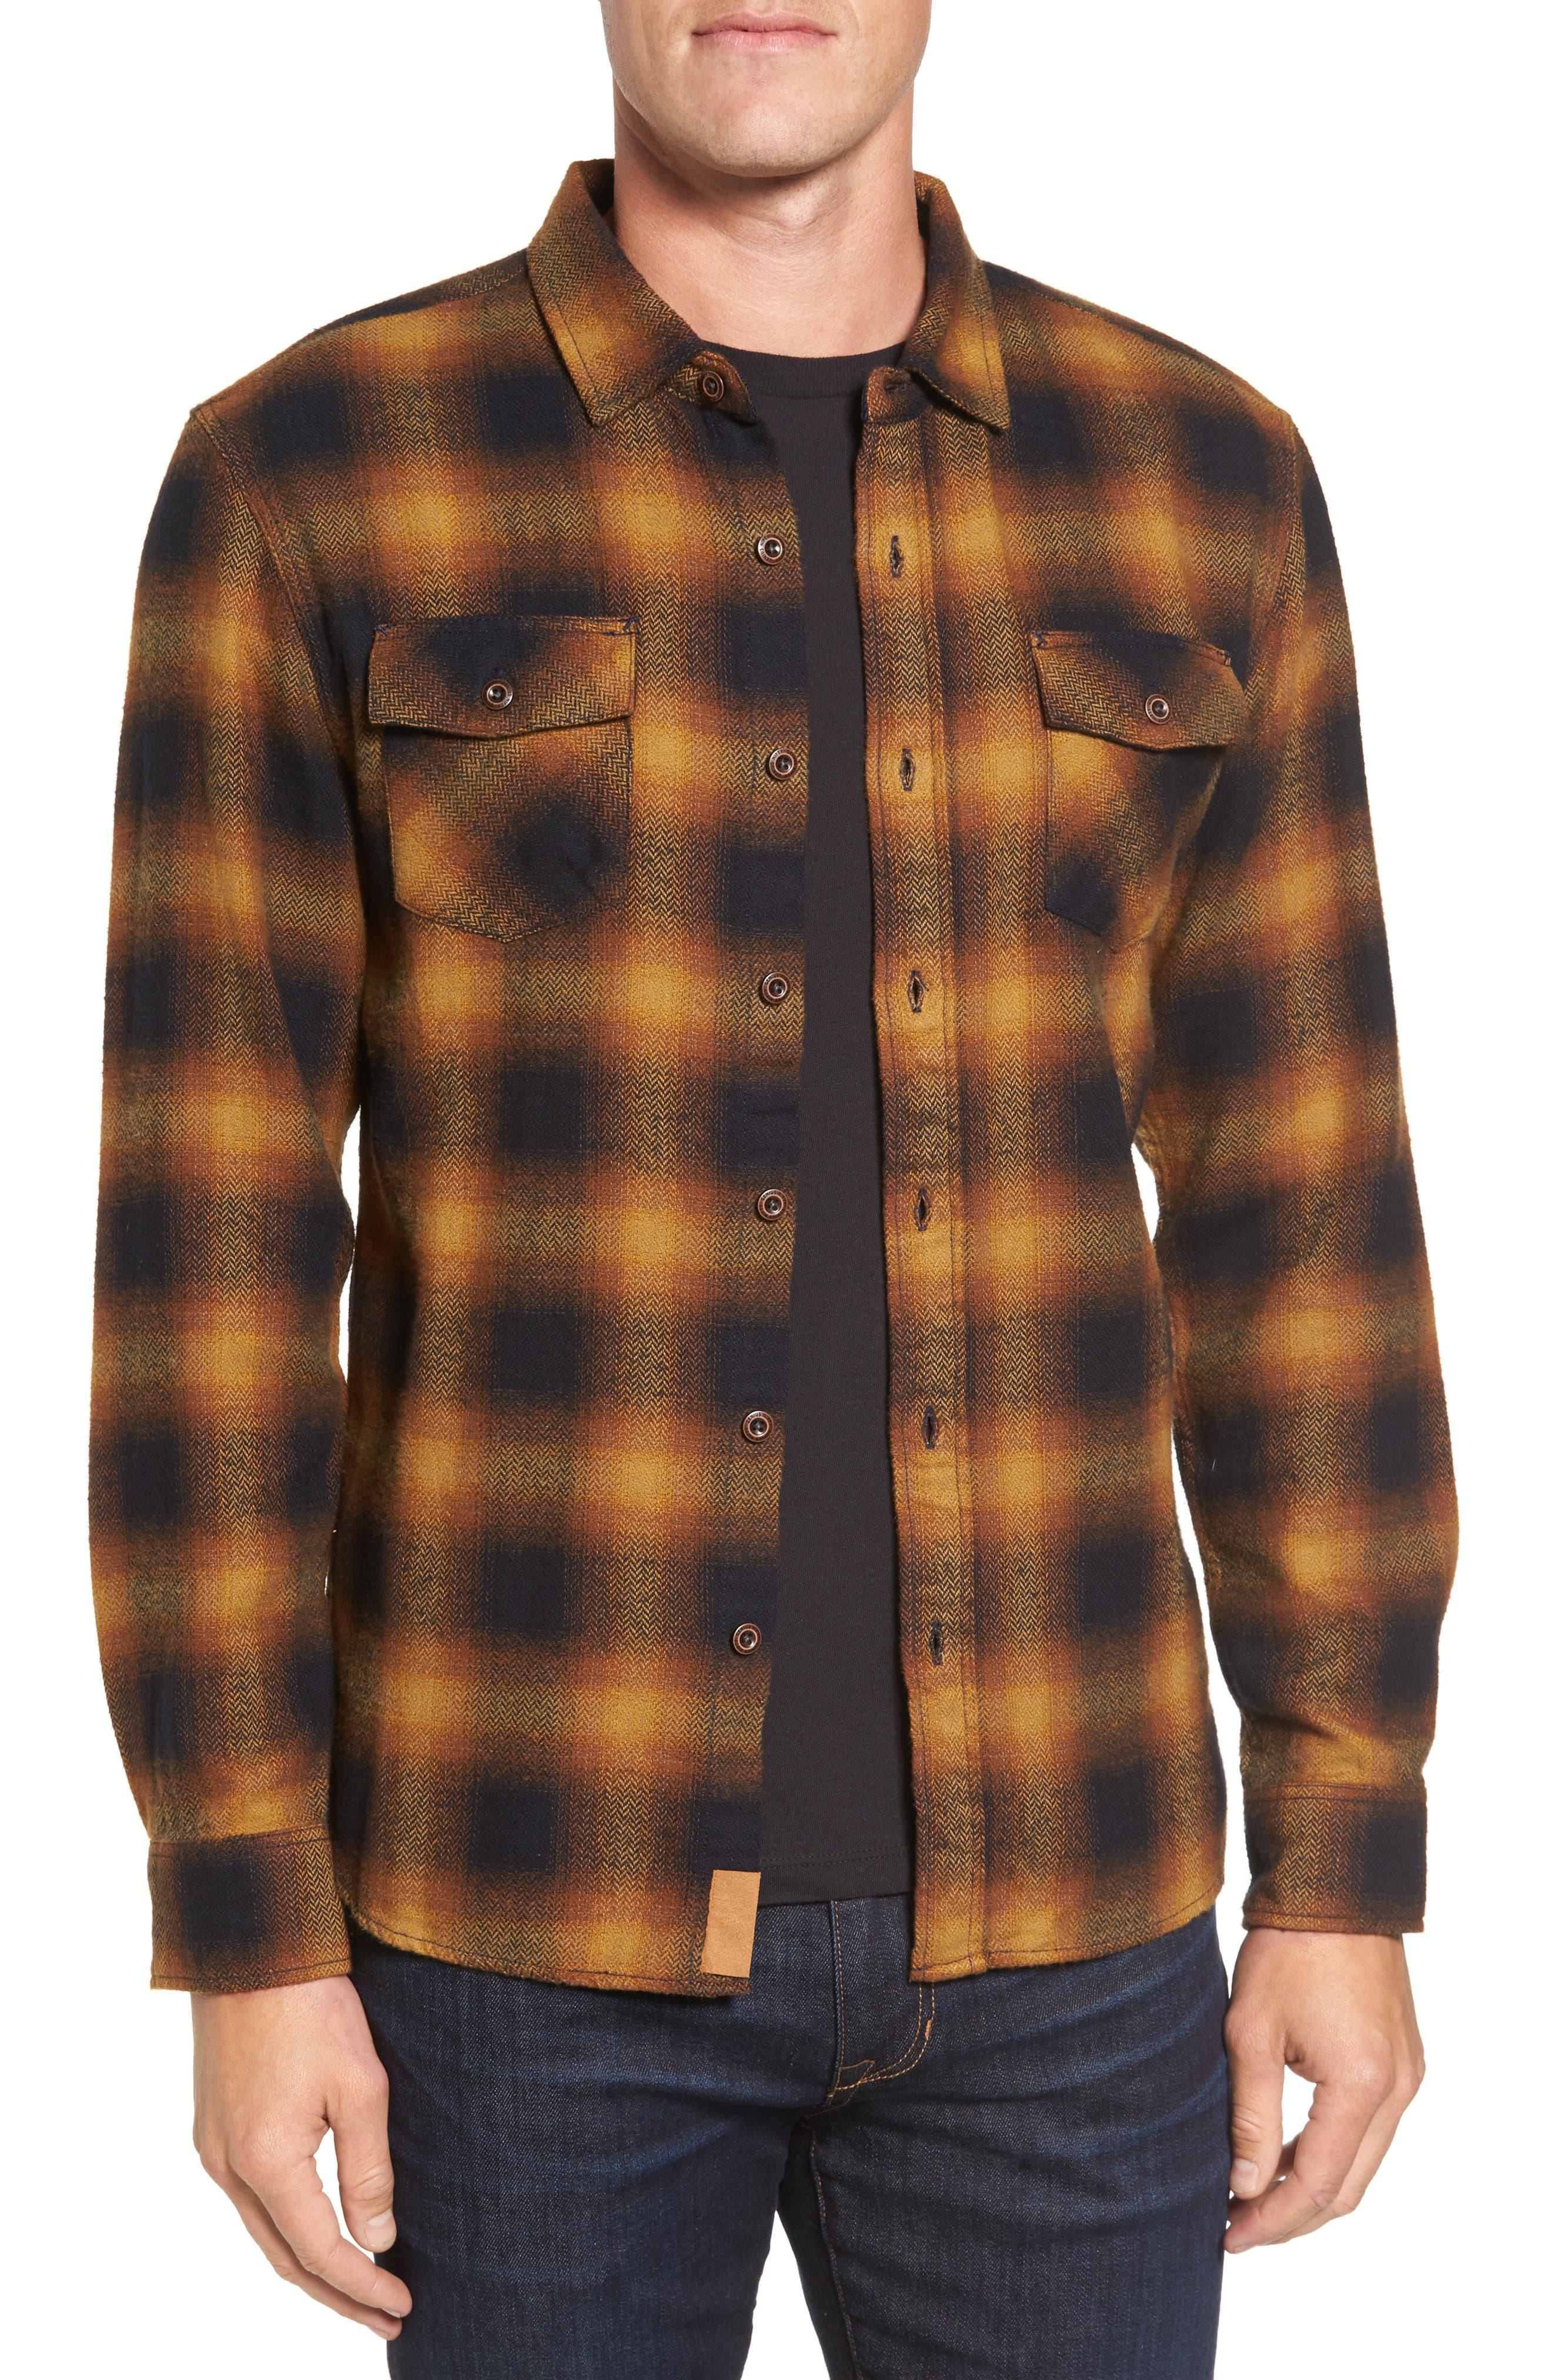 Main Image - Nifty Genius Truman Check Herringbone Shirt